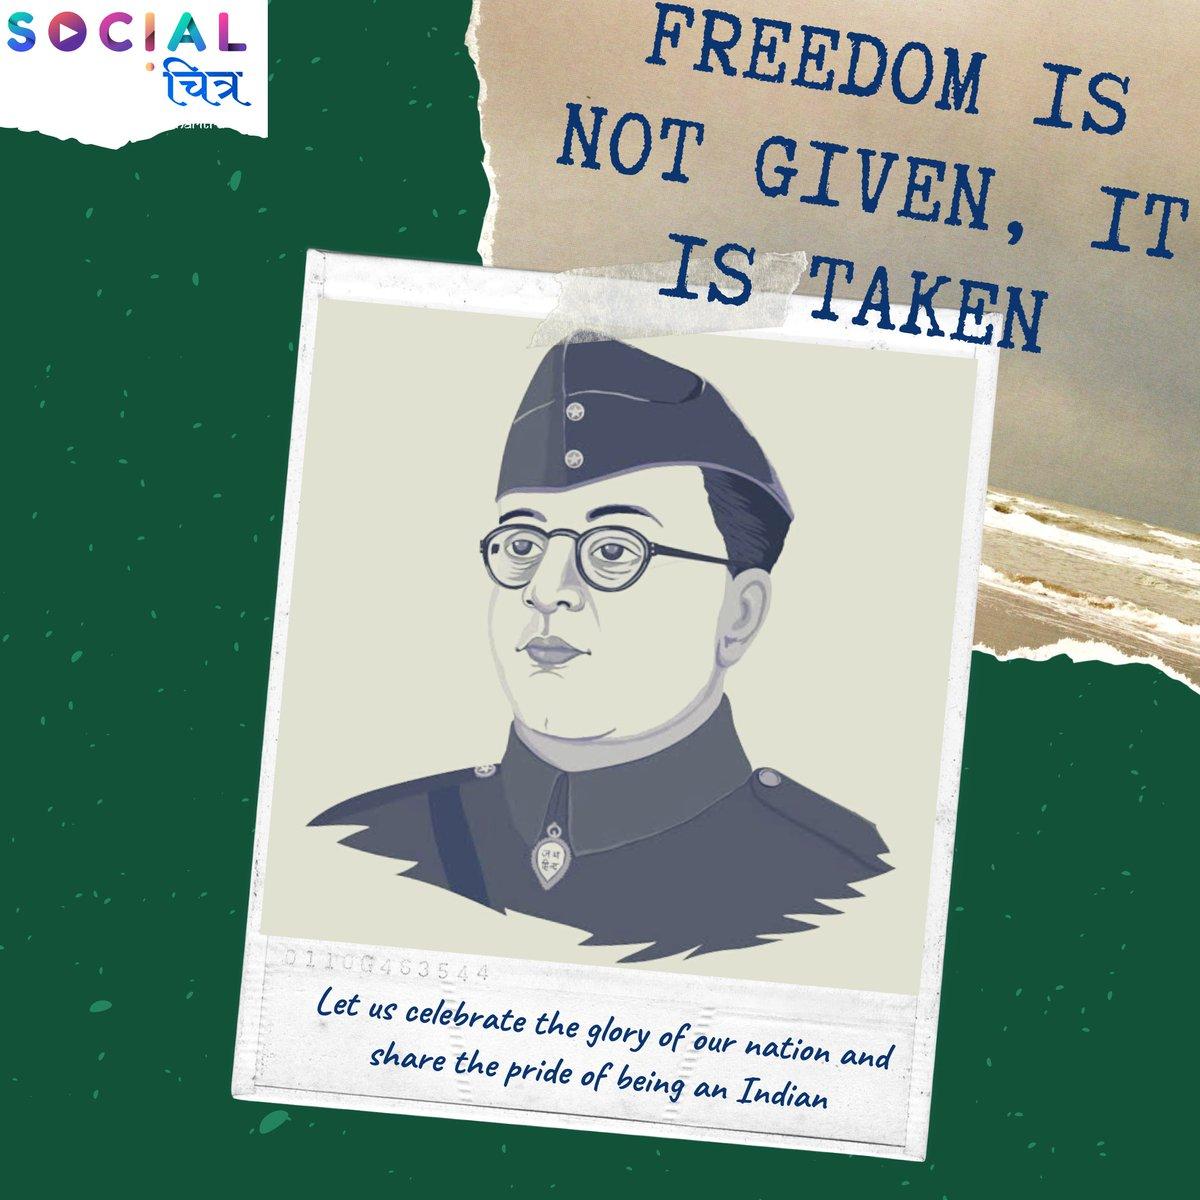 Let's celebrate the fighter, who stood by us. Happy Subhash Chandra Bose jayanti🇮🇳🇮🇳 . . . . . .  #SocialChitra #trending #trendingnow #pongal #subhashchandrabose #socialmediamarketing #socialmedia #business #marketingdigital #seo #branding #onlinemarketing #instagram